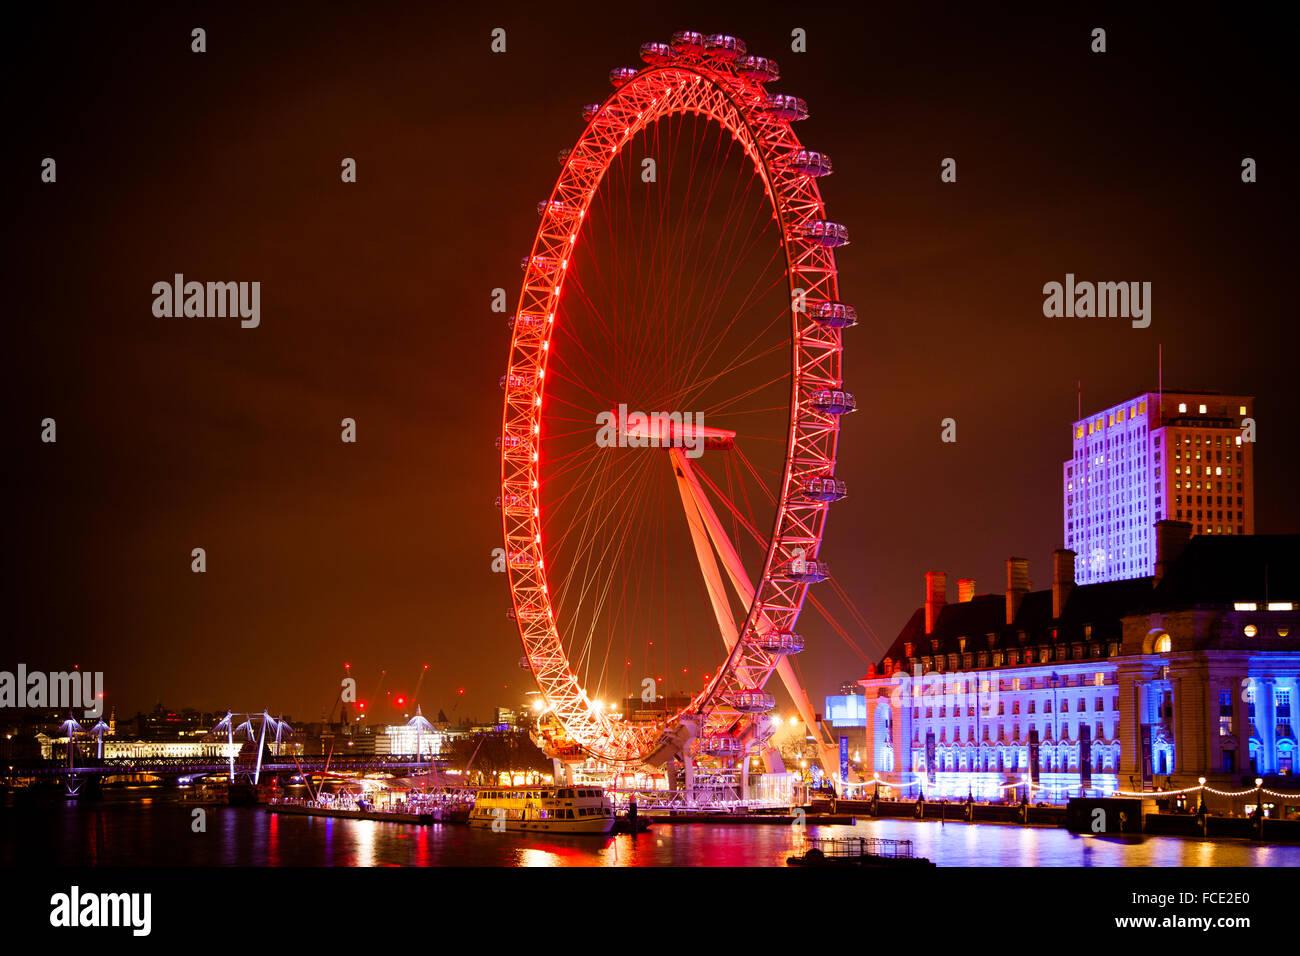 Famous London Eye big wheel at night - Stock Image